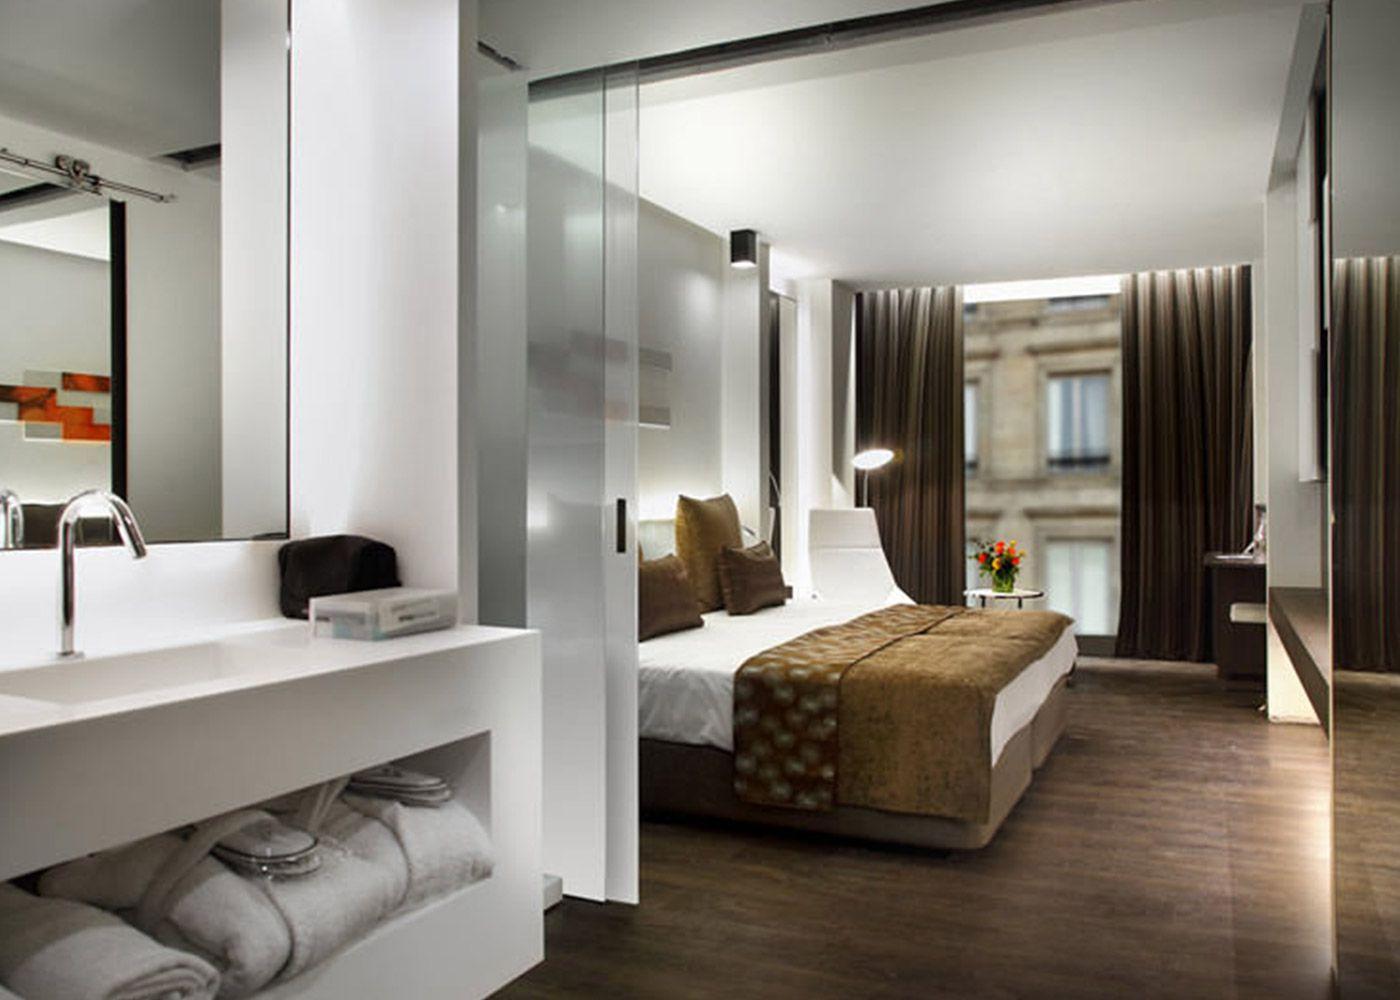 hotel-olivia-balme-solid-surface-2